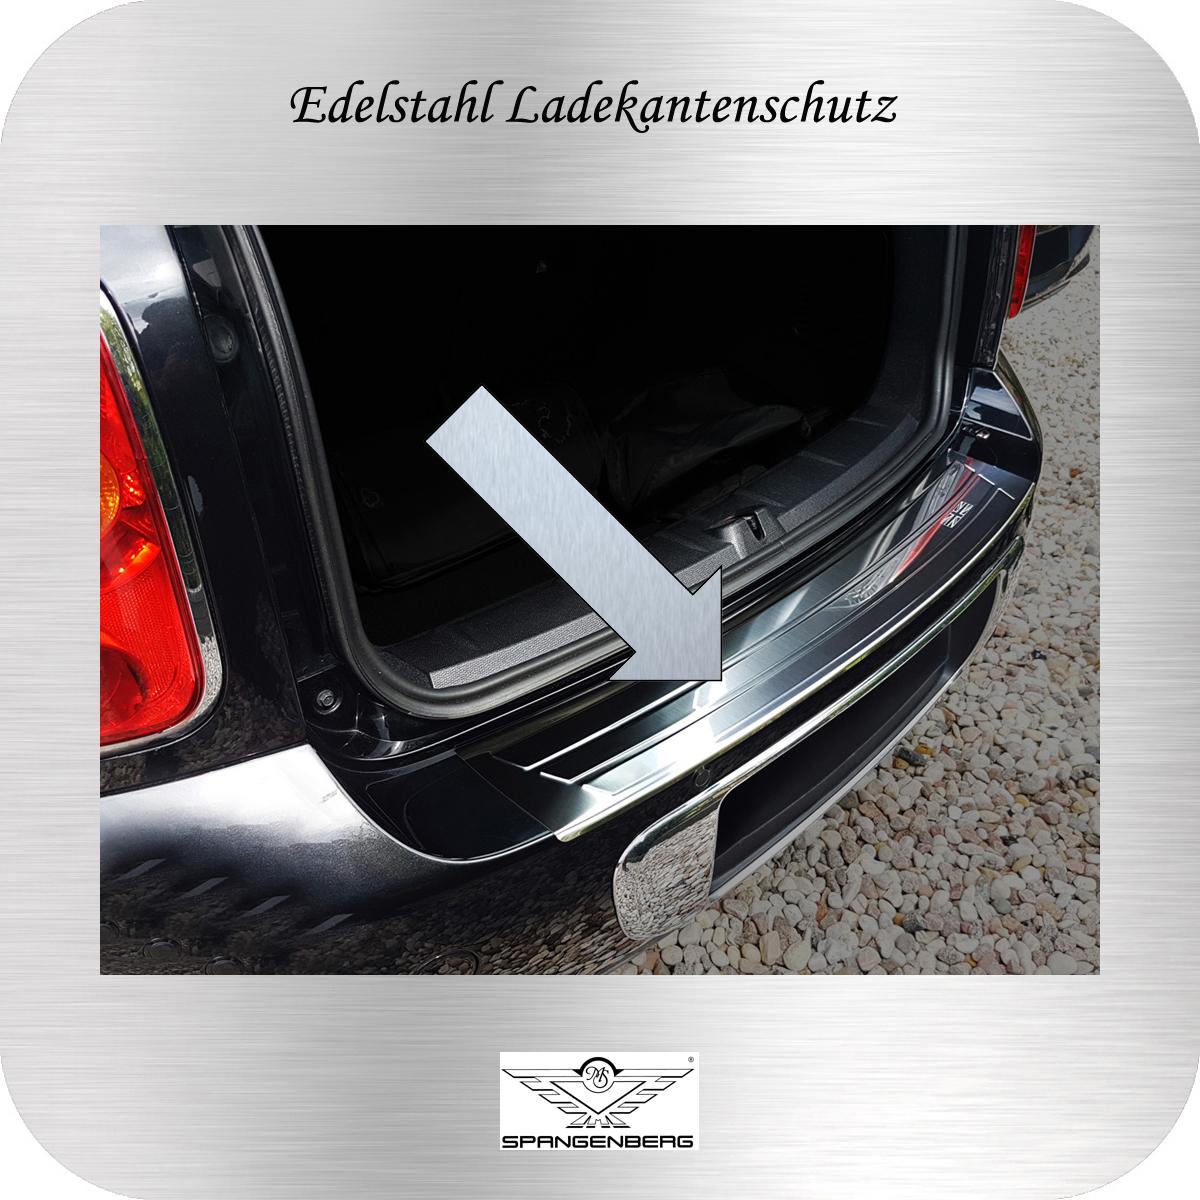 Ladekantenschutz Edelstahl MINI Countryman R60 2010-2016 3235443